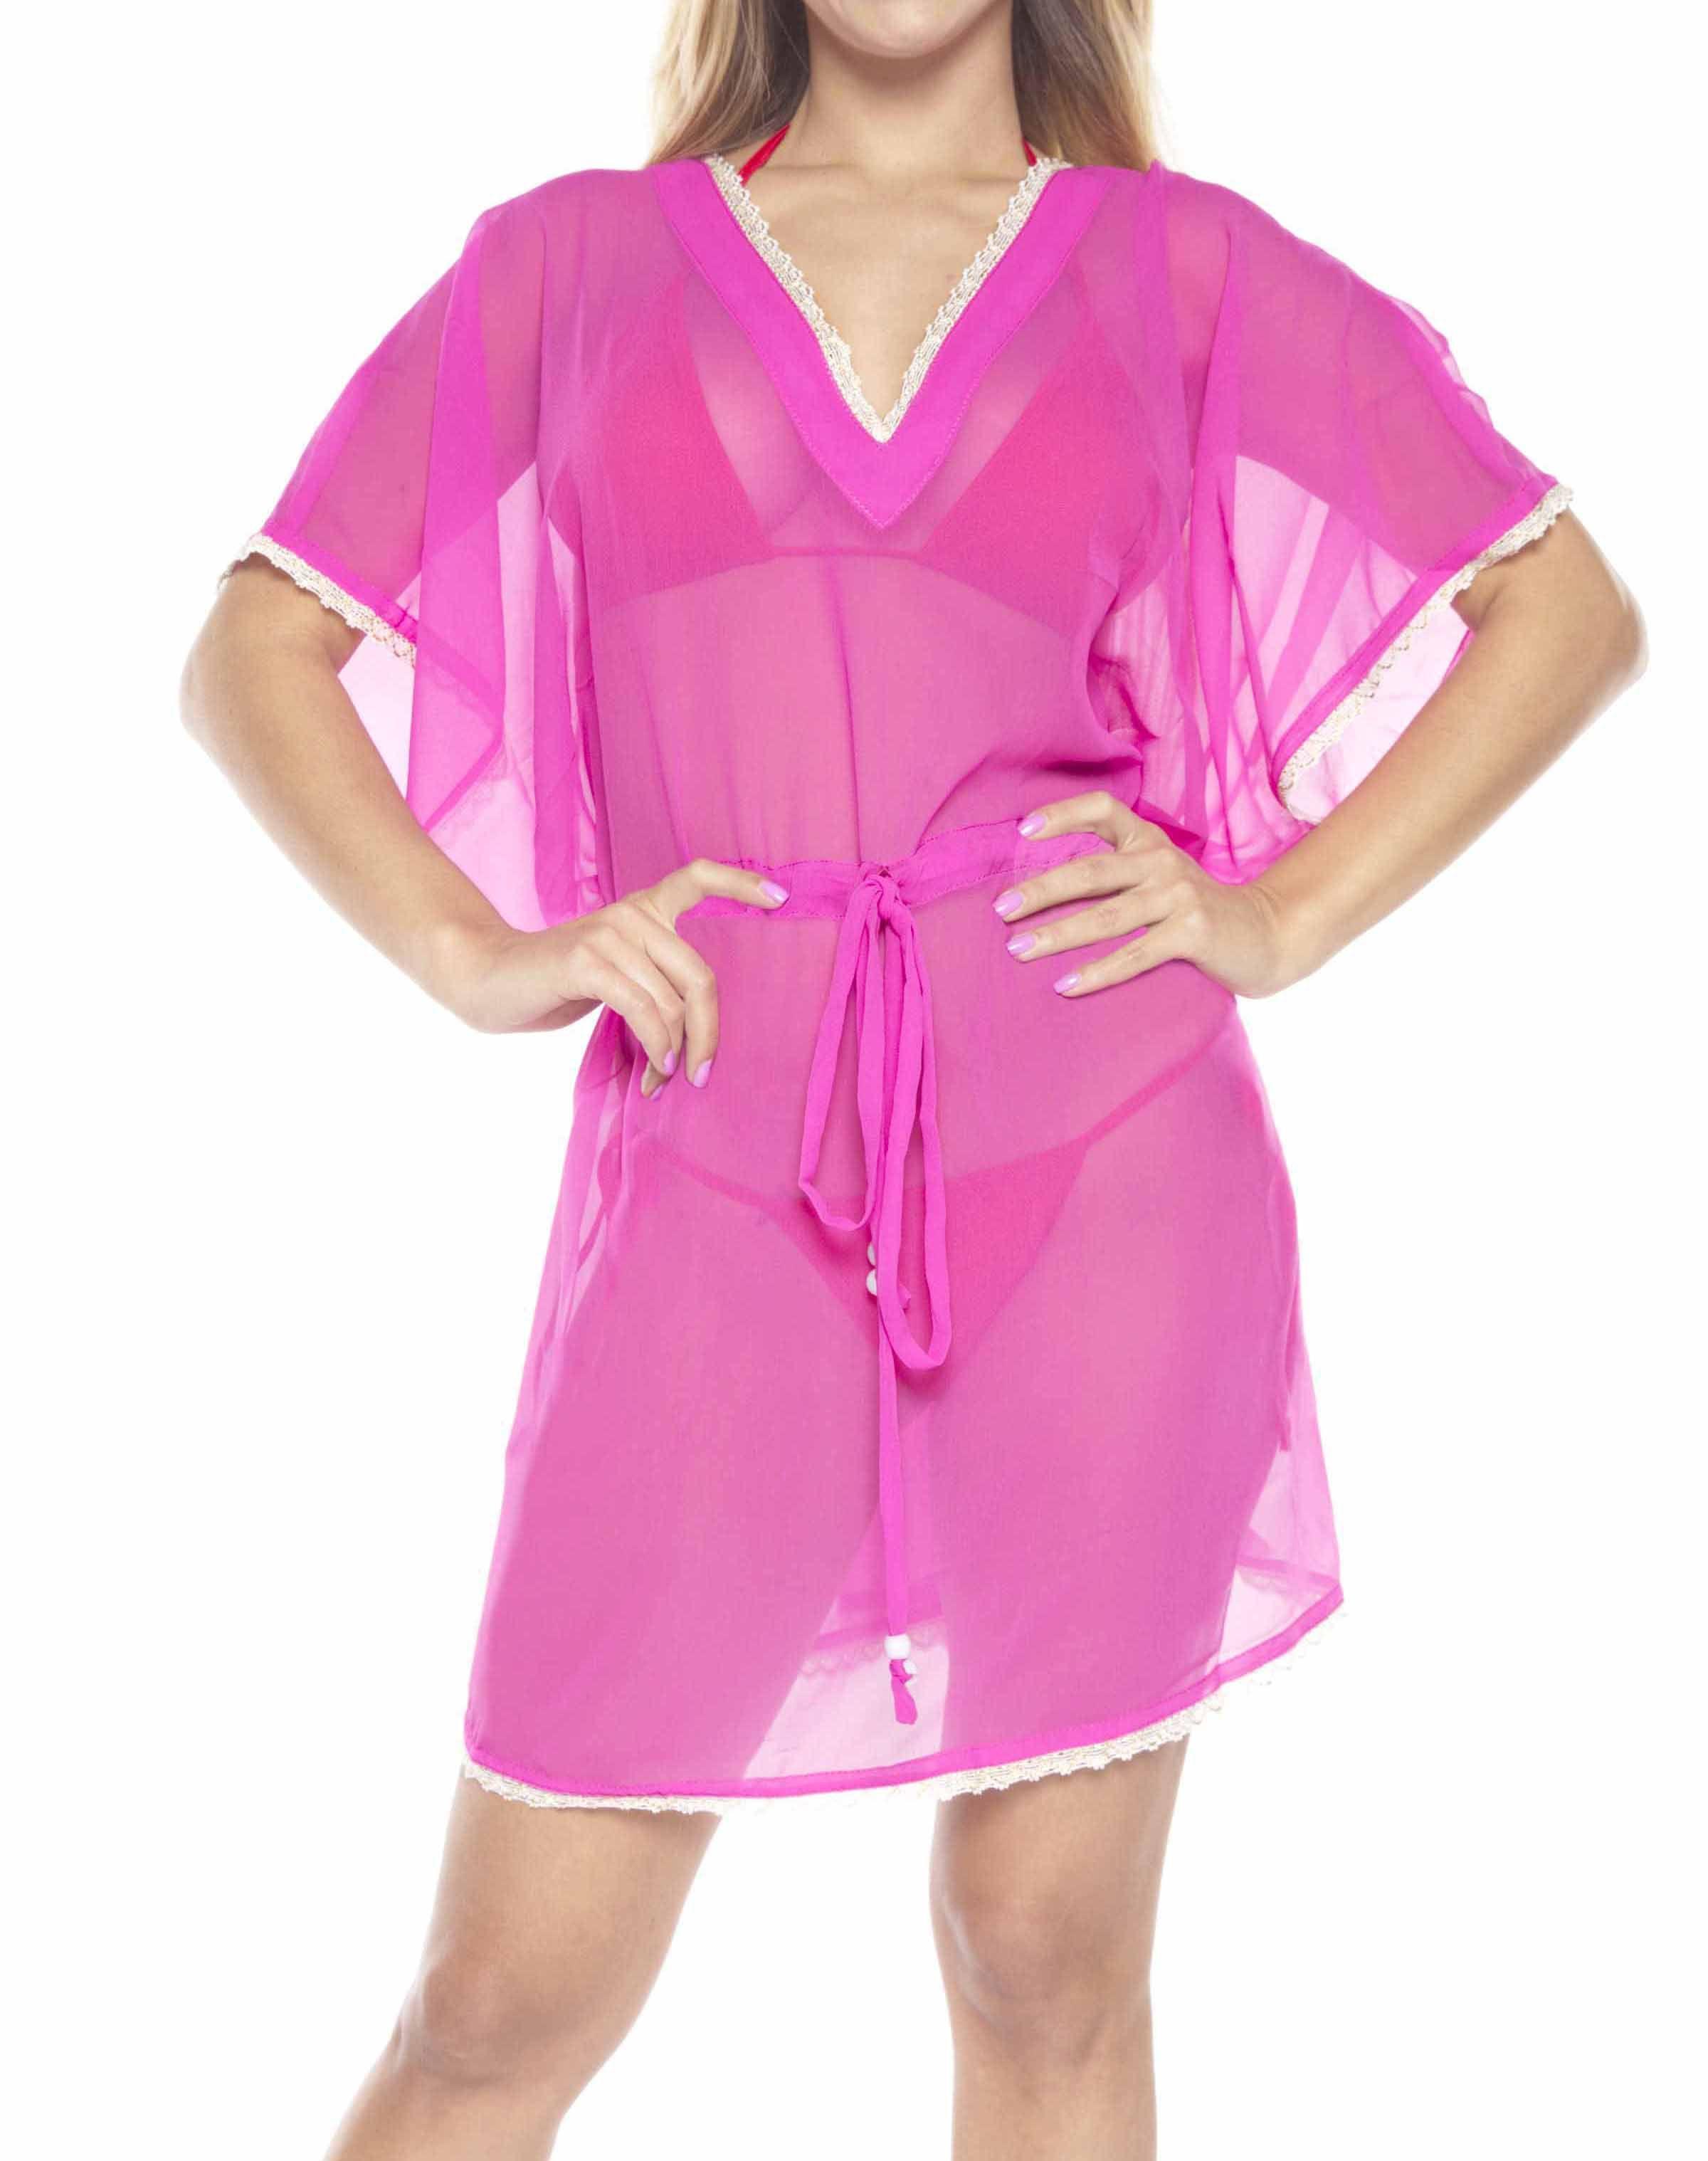 2f312c532 Women's Chiffon Beachwear Kimono Swimwear Swimsuit Bikini Cover ups  Blouse#Kimono, #Swimwear, #Beachwear